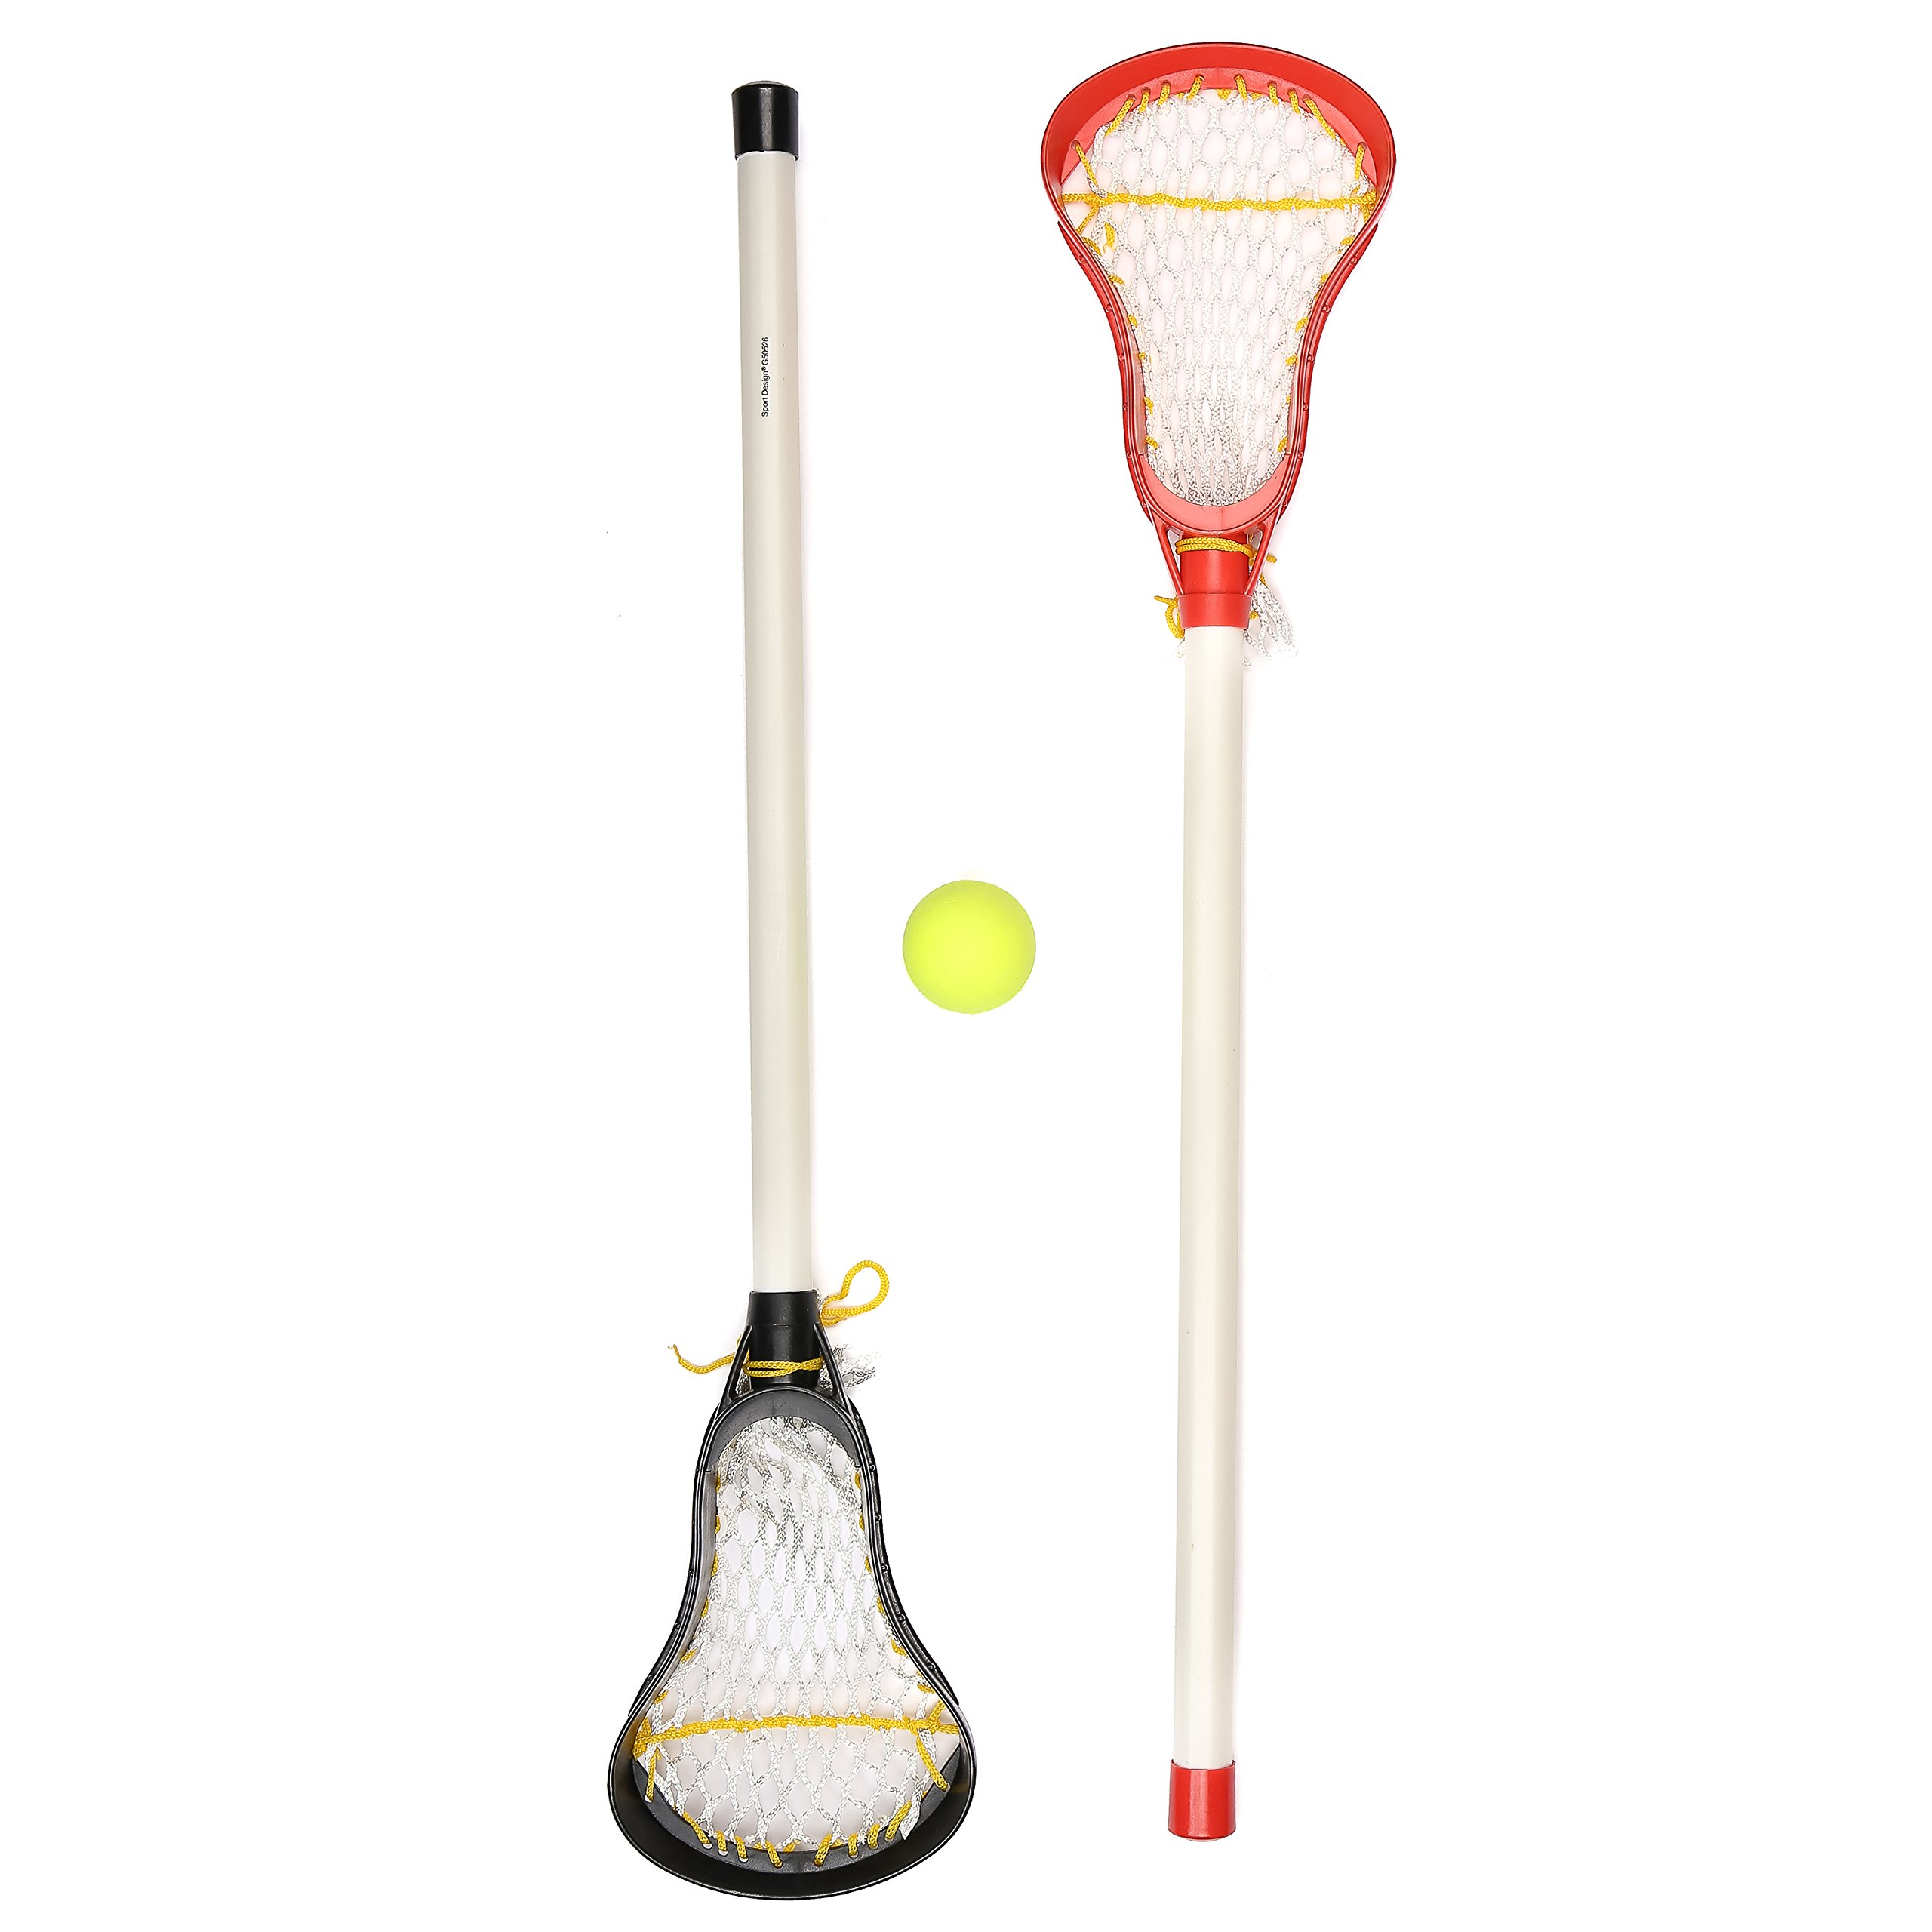 Kids Lacrosse Sticks - 2 Sticks (30 Inches) & 1 Ball - Soft Mesh Pockets, Durable Plastic Handles, & Large Head Design by Junior Lacrosse (Image #5)